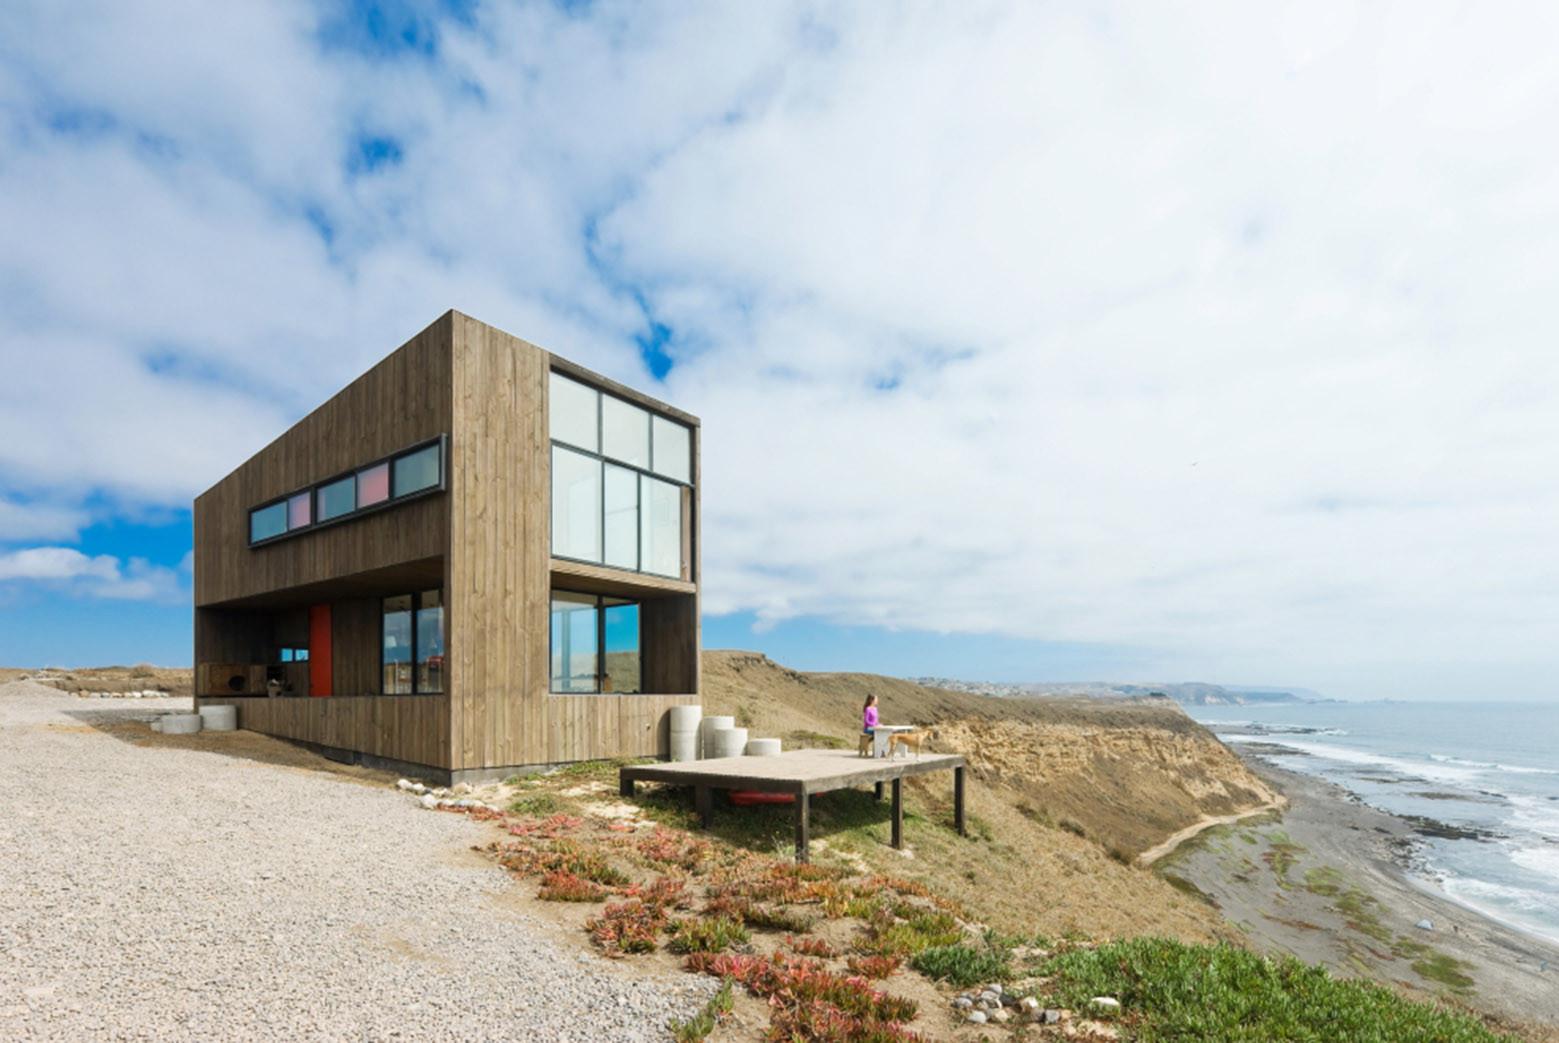 Puccio House / WMR Arquitectos, © Sergio Pirrone